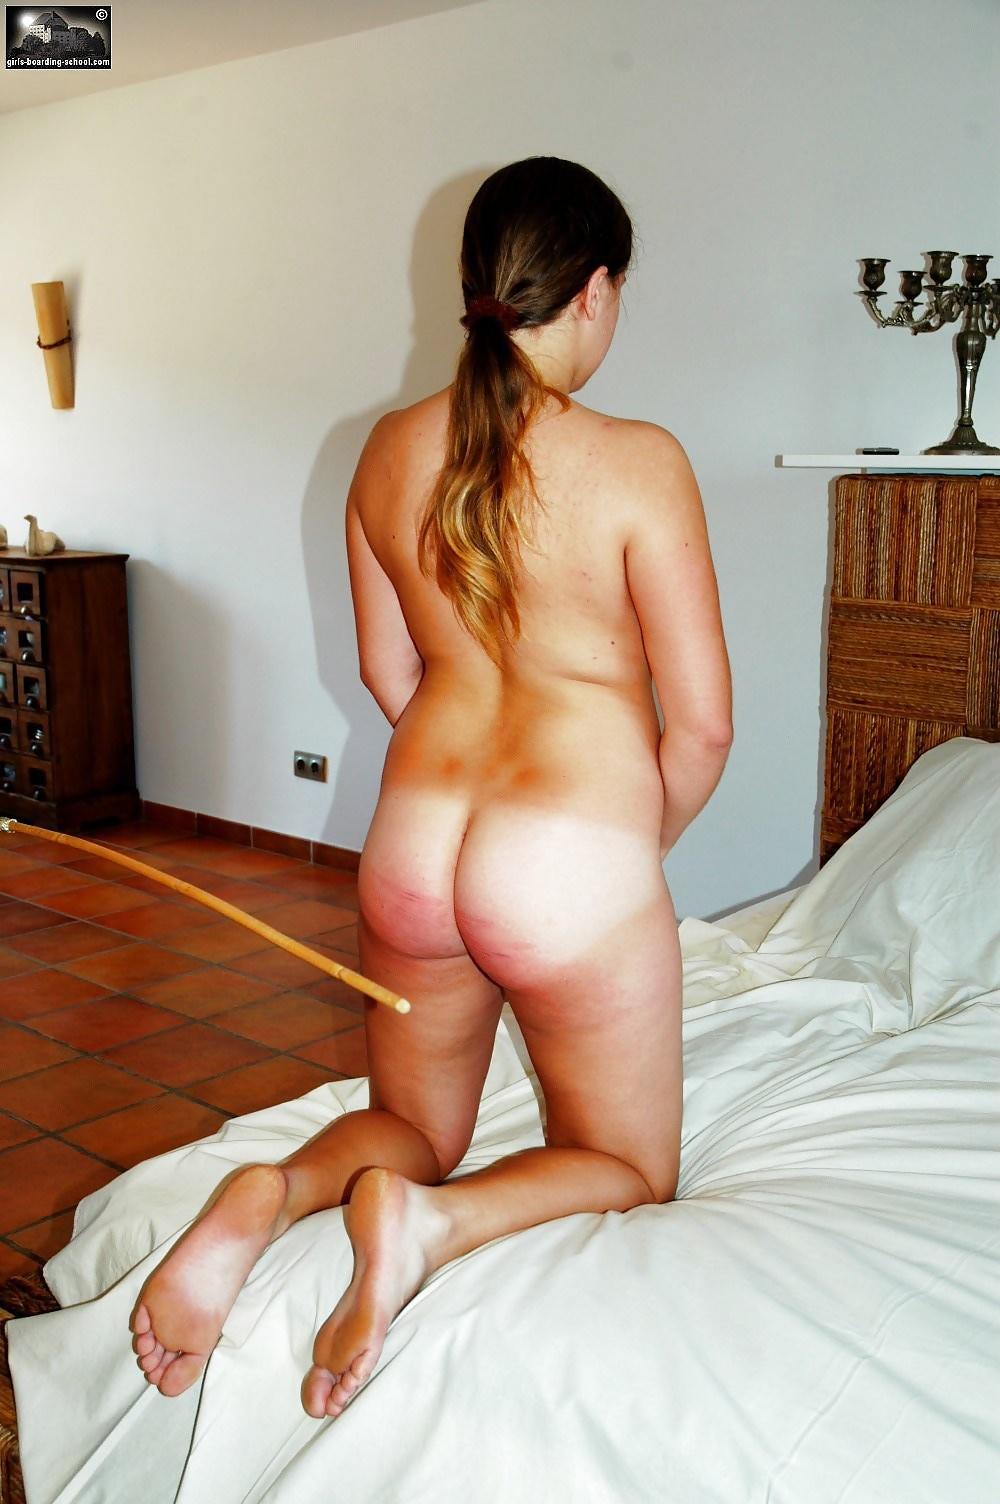 spanking-naked-hitmom-fuck-junior